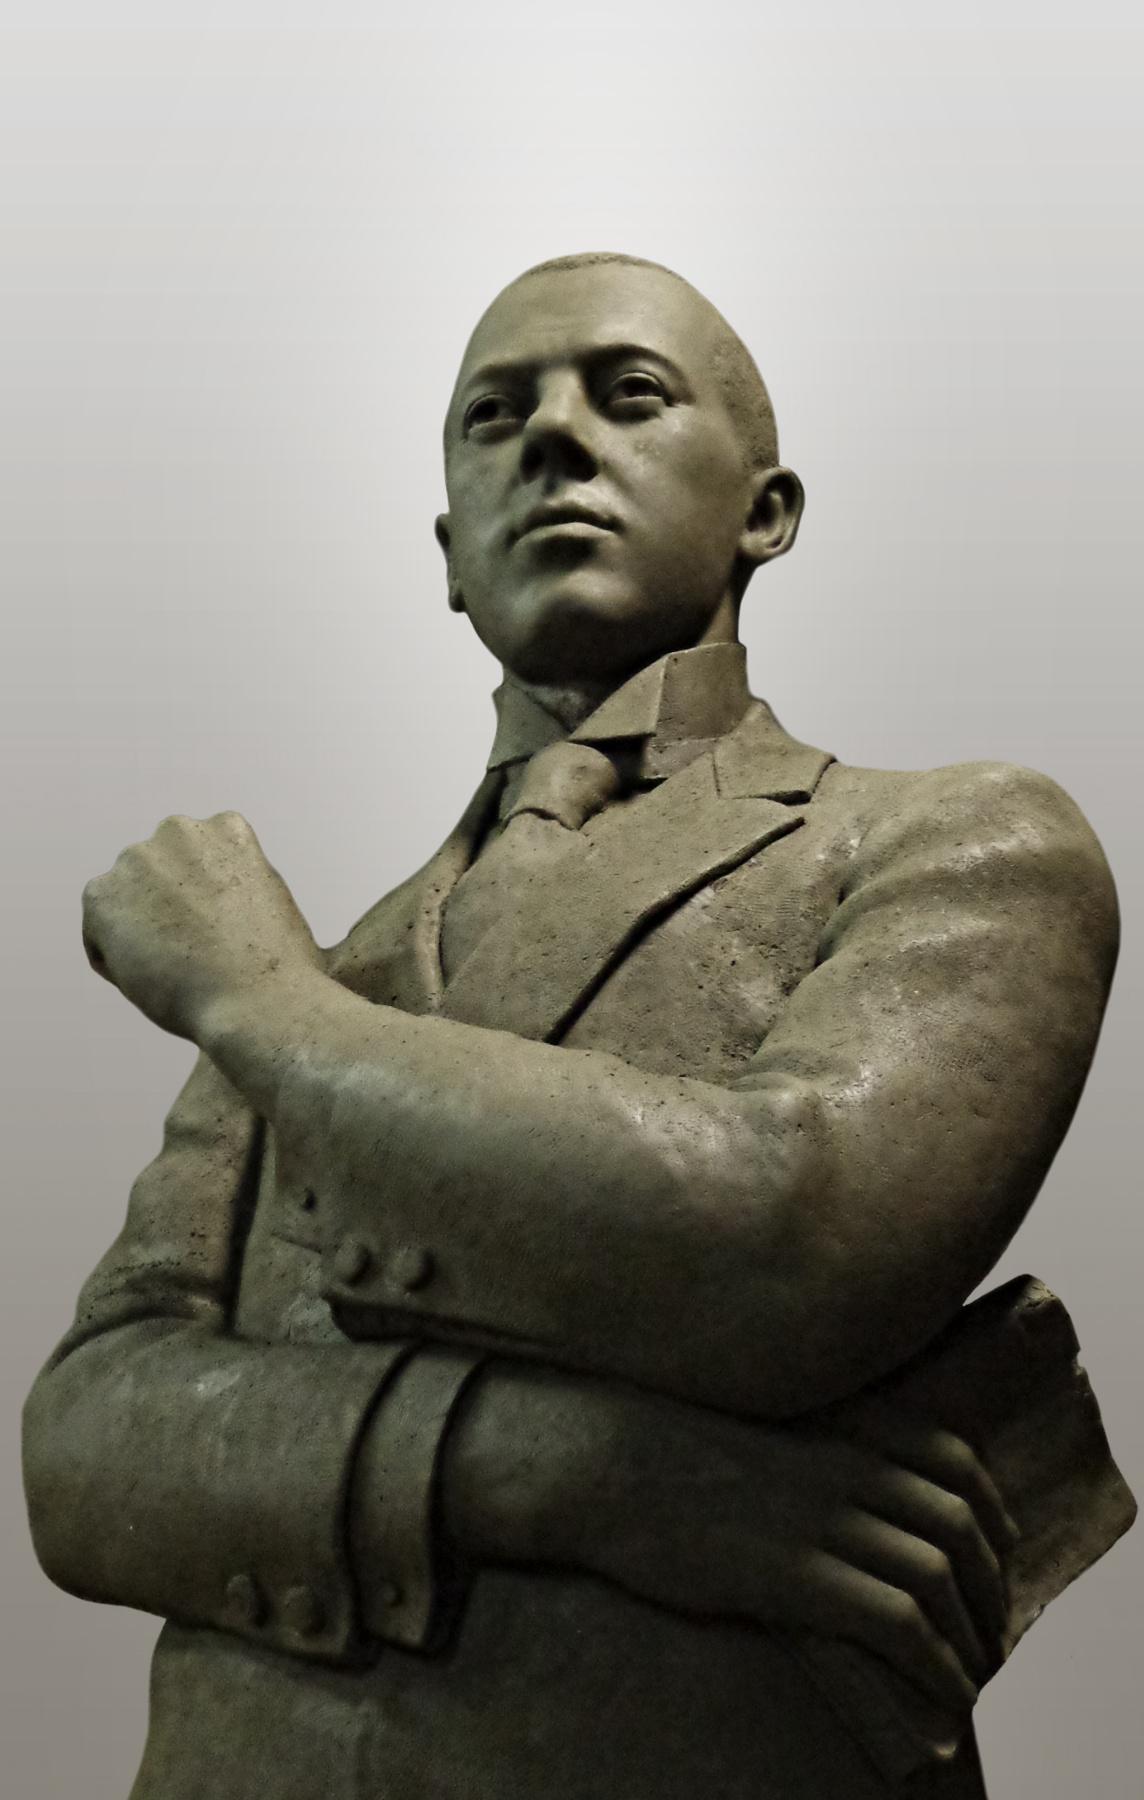 Anton Alekseevich Gordeenko. Monument to Gumilyov N.S.